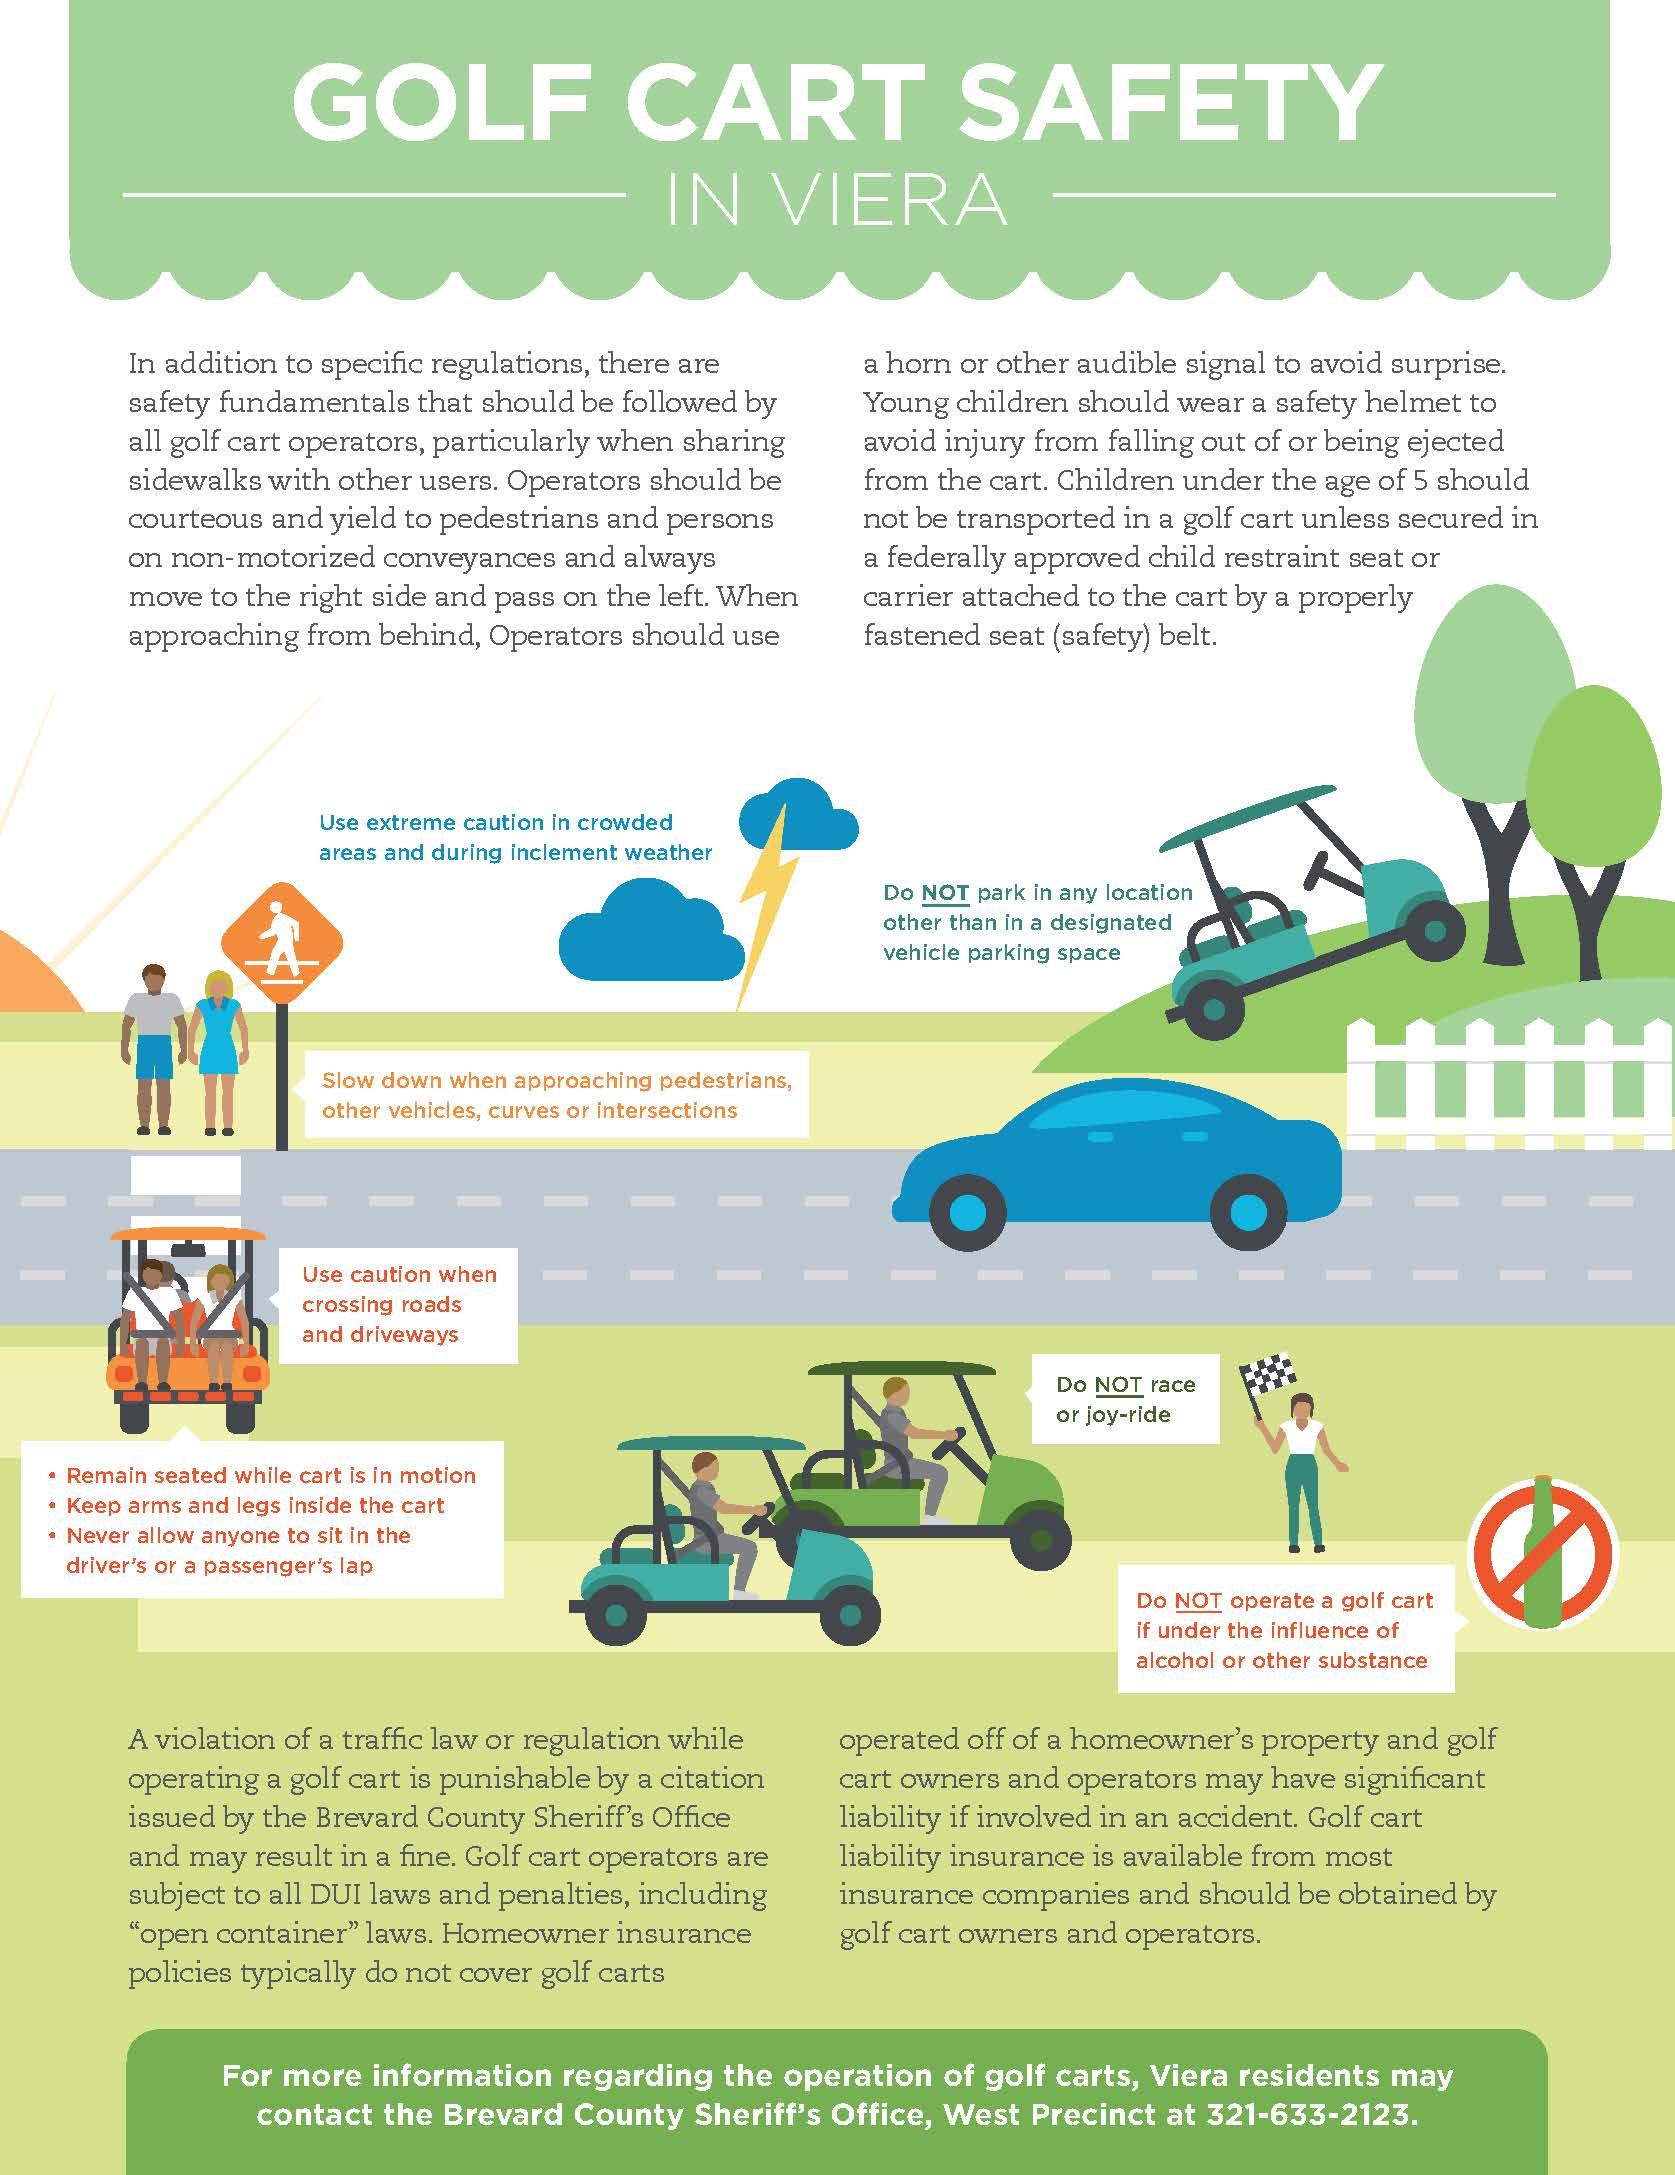 2018 Golf Carts >> Golf Carts – Central Viera Community Association - CVCA